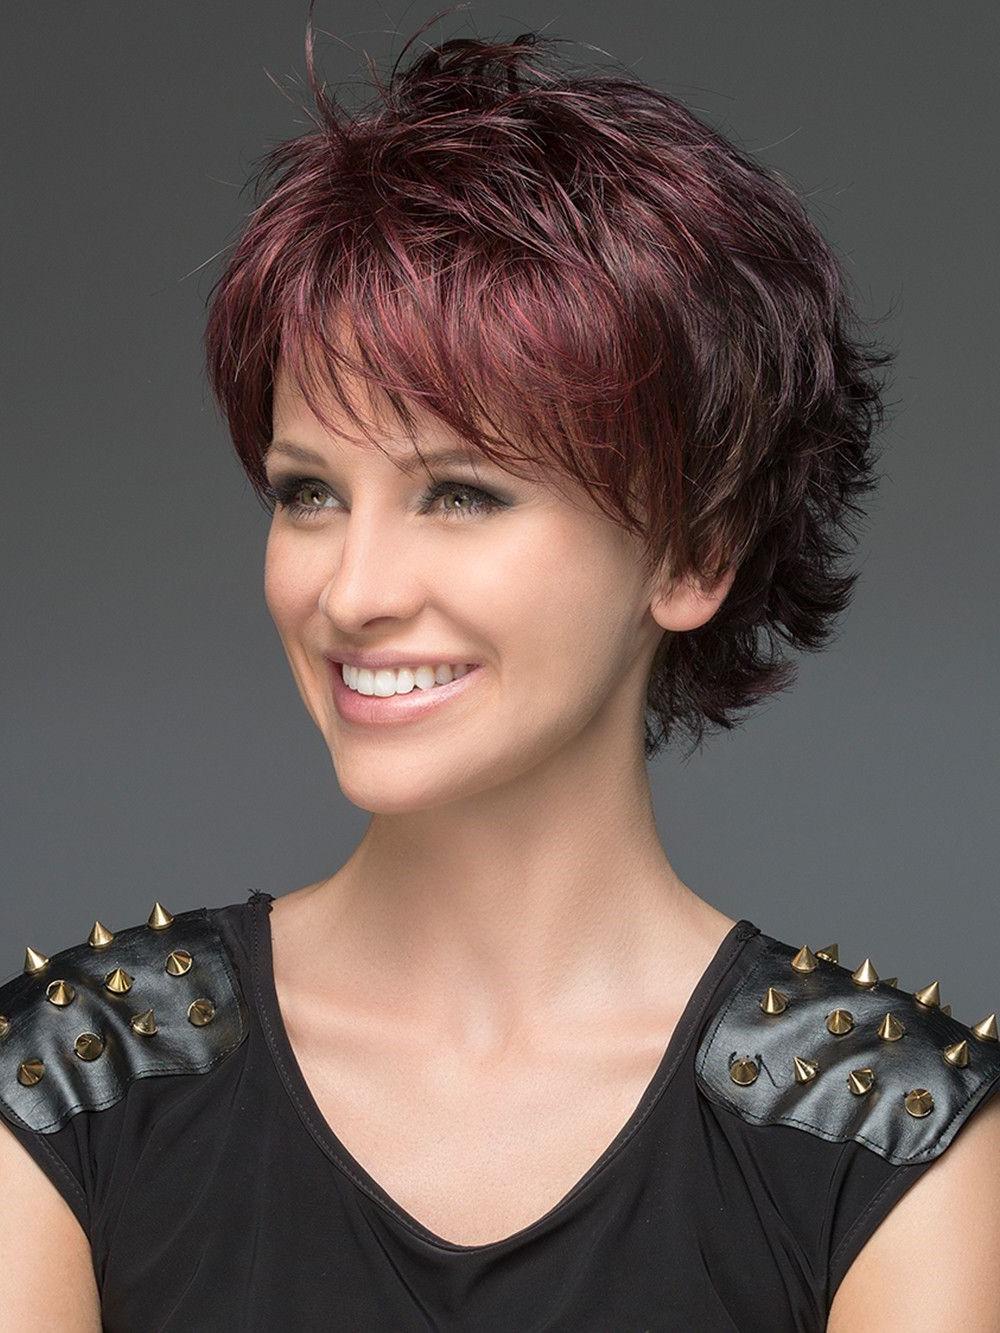 Two Ways To Wear A Short Shag Haircut Regarding Platinum Short Shag Haircuts (View 10 of 20)